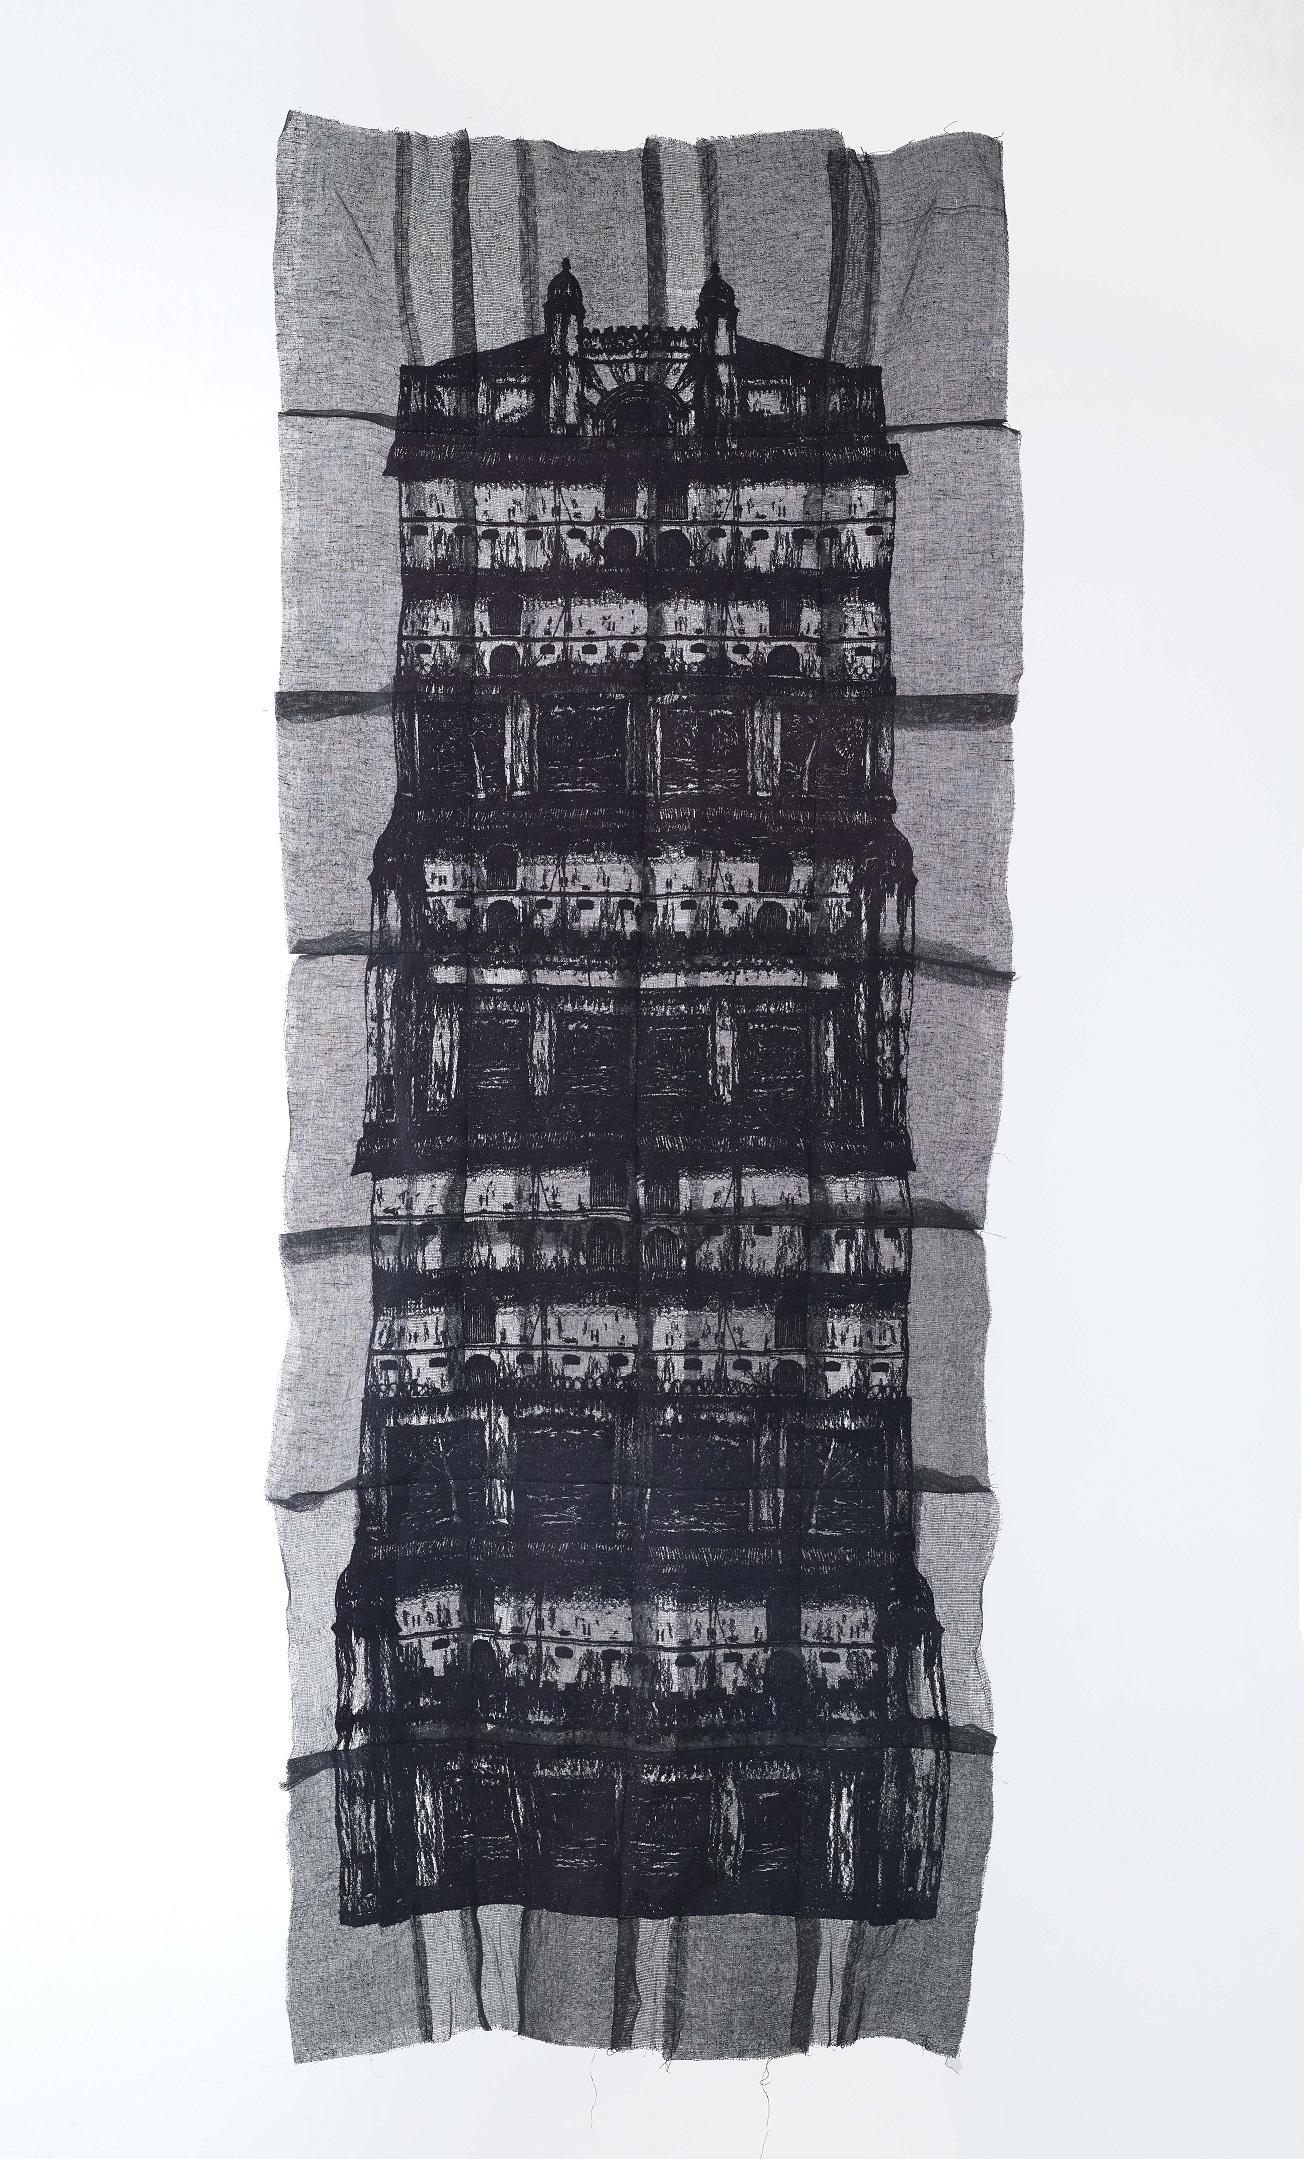 Yim Yen Sum - Whisper Silhouette II (2018) Embroidery on gauze, gauze dyed in acrylic; 184cm(H) x 75cm(W)